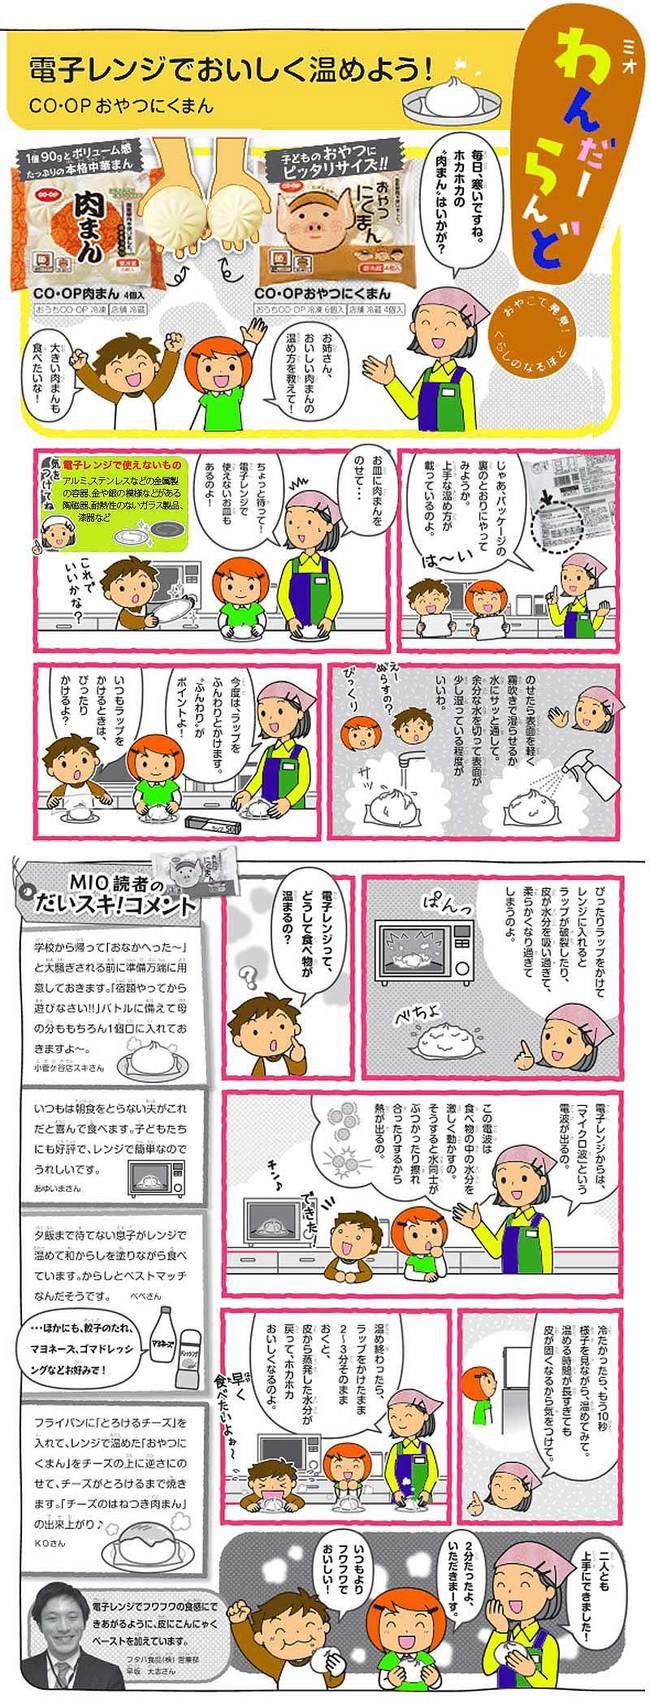 130113nikuman1-thumb-650x1703-38515.jpg